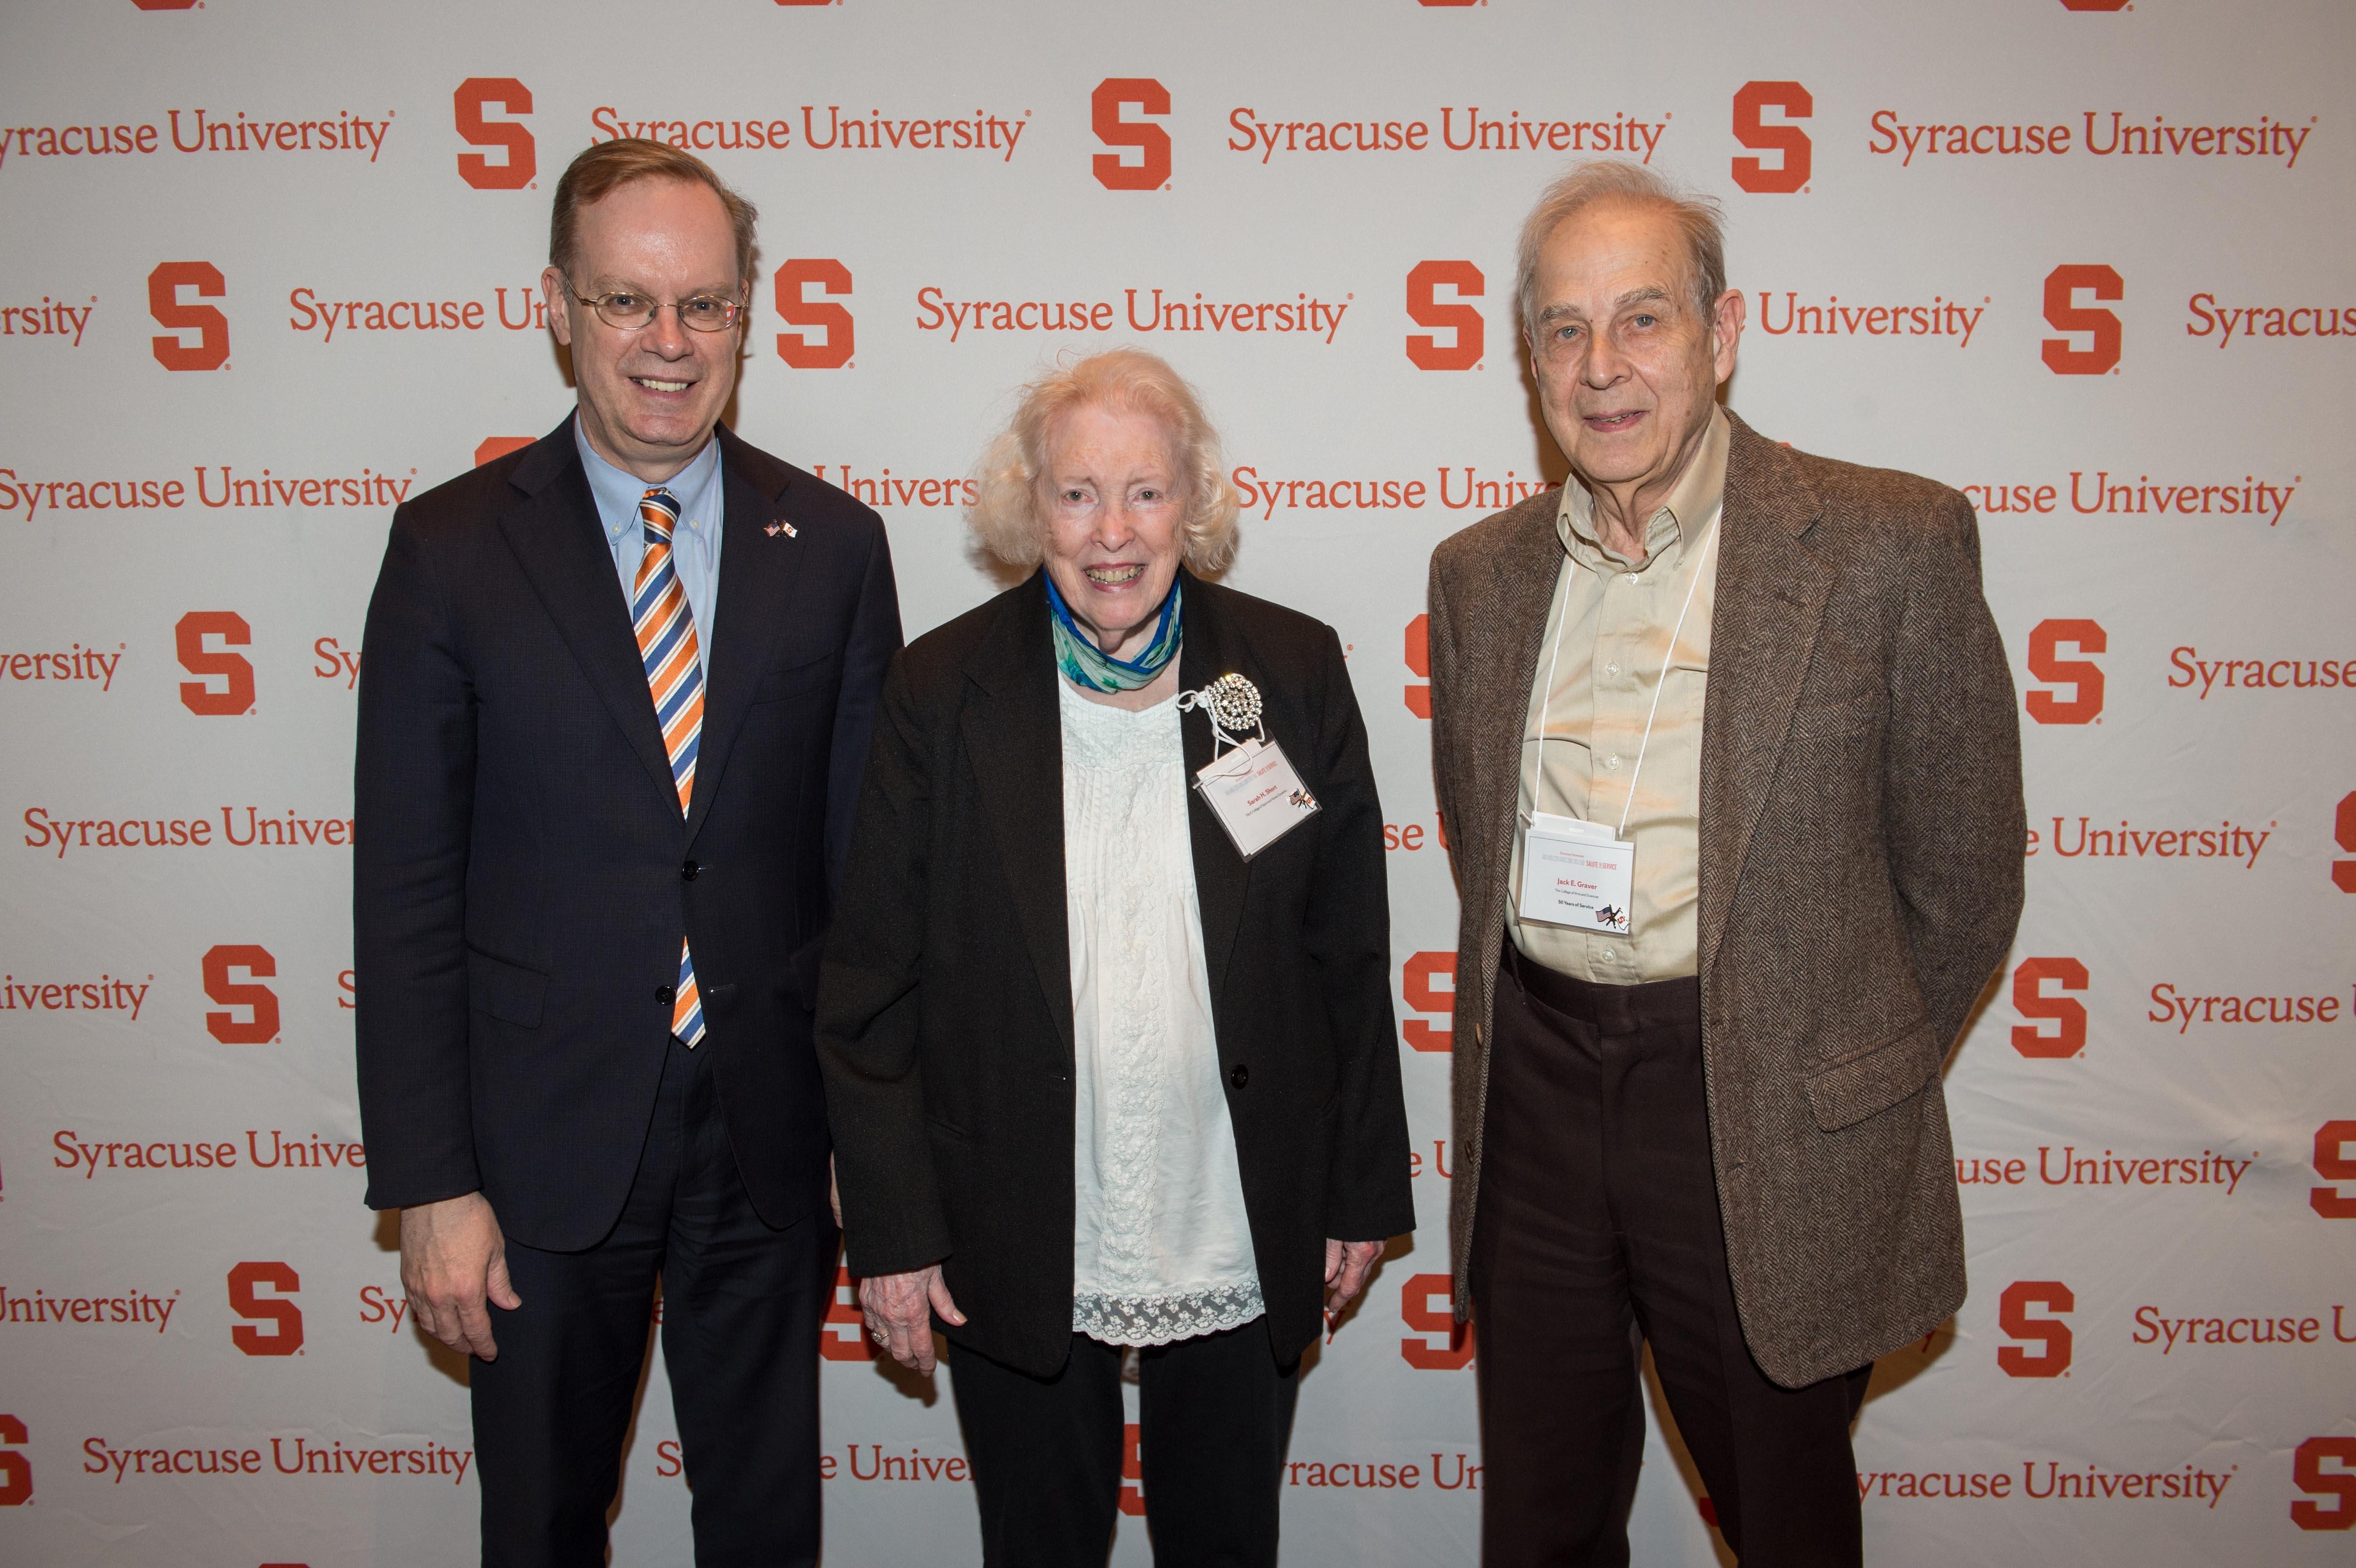 Chancellor Syverud, Sarah Short, Jack Graver